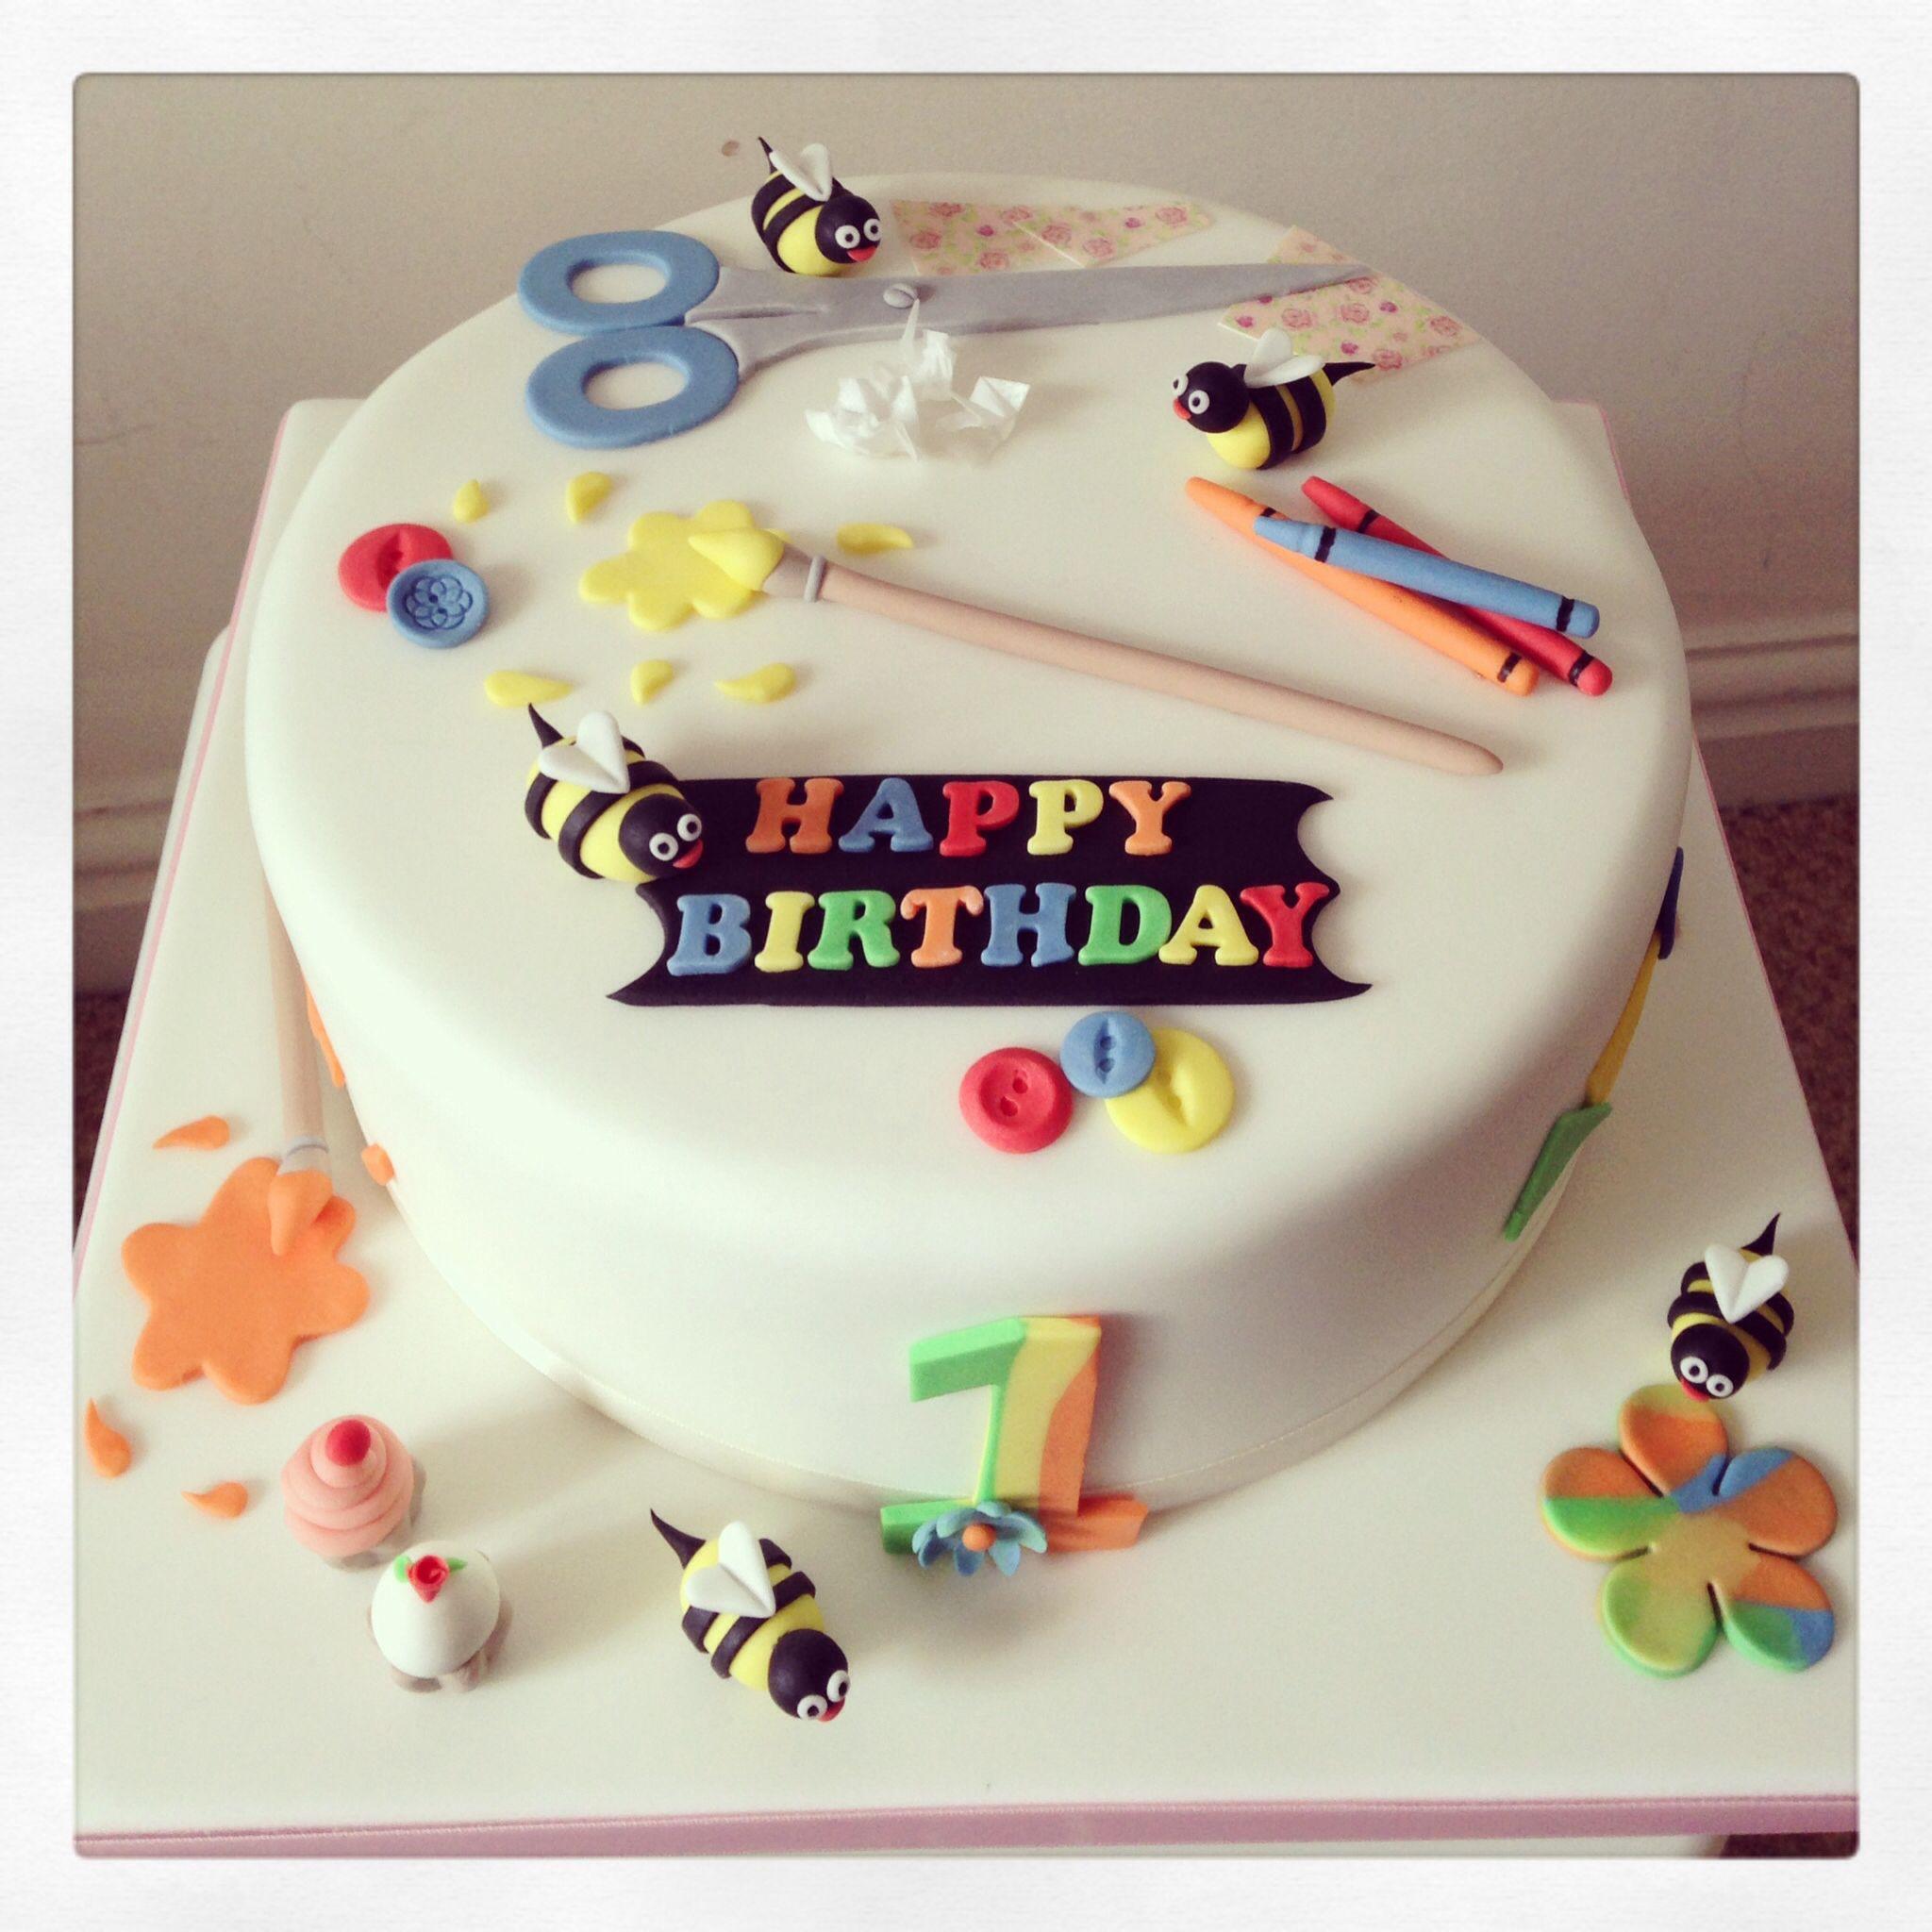 Arts and crafts birthday cake yummy treats Pinterest Birthday